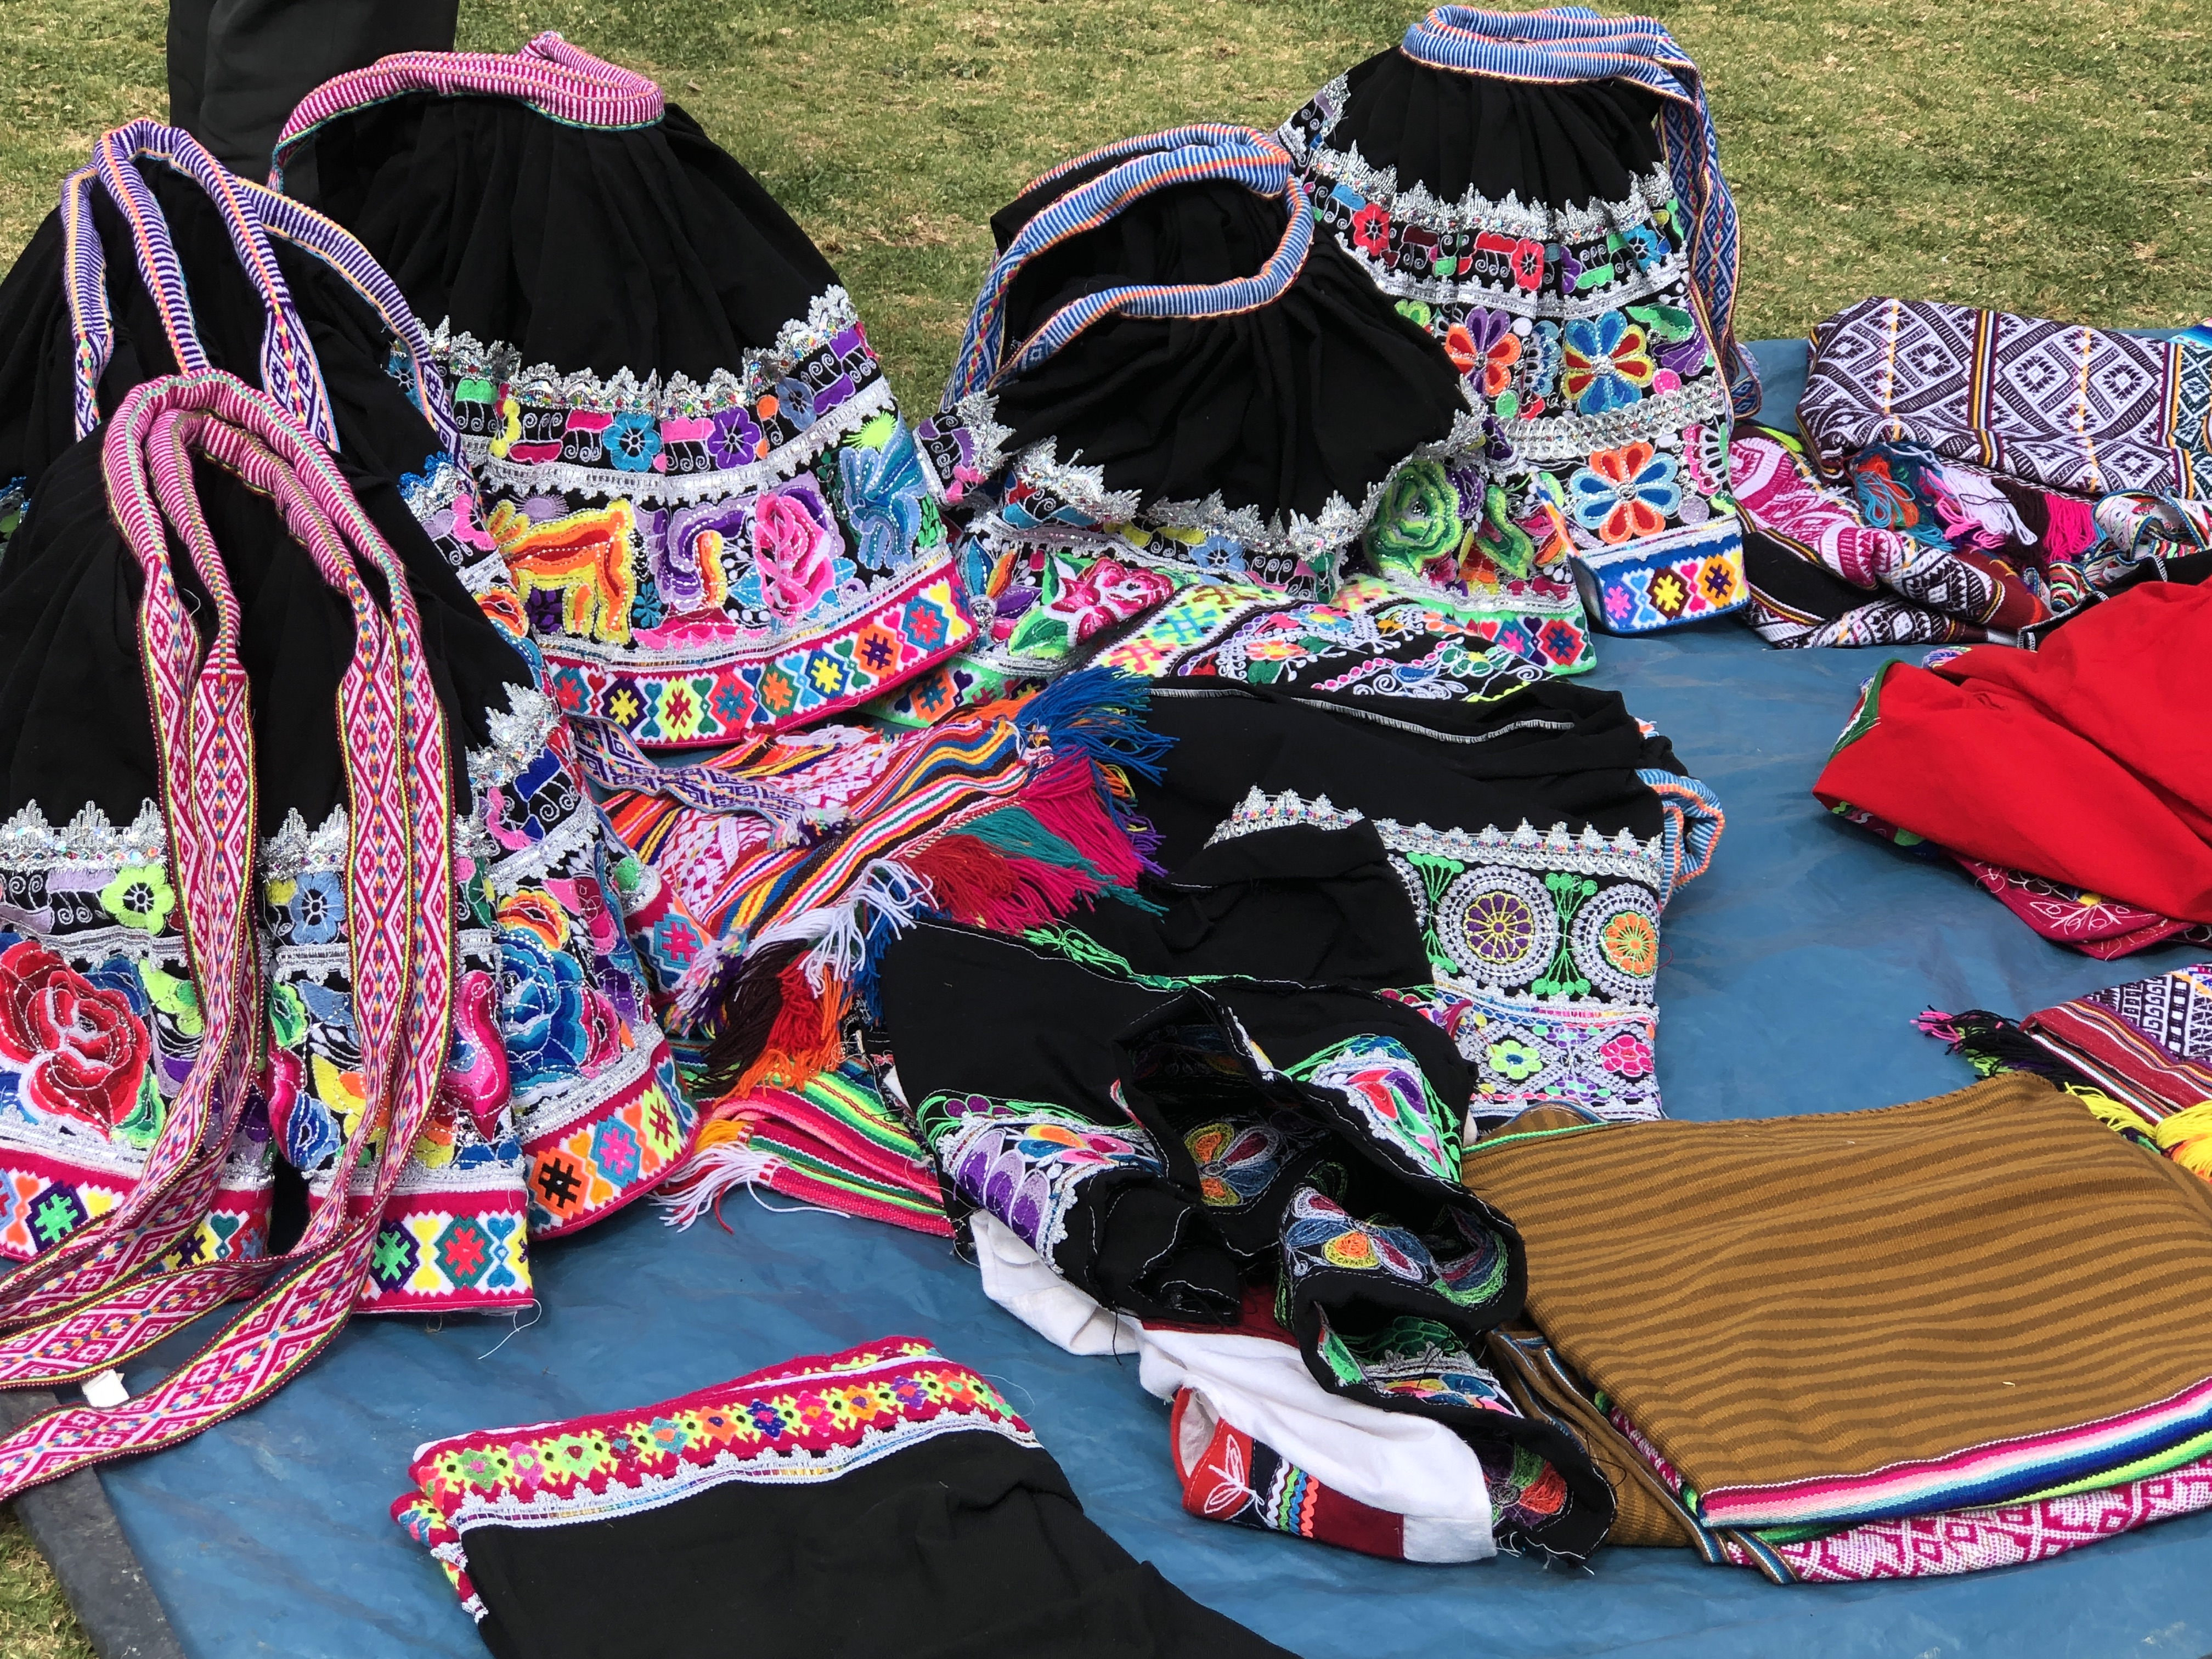 skirts for sale.JPG